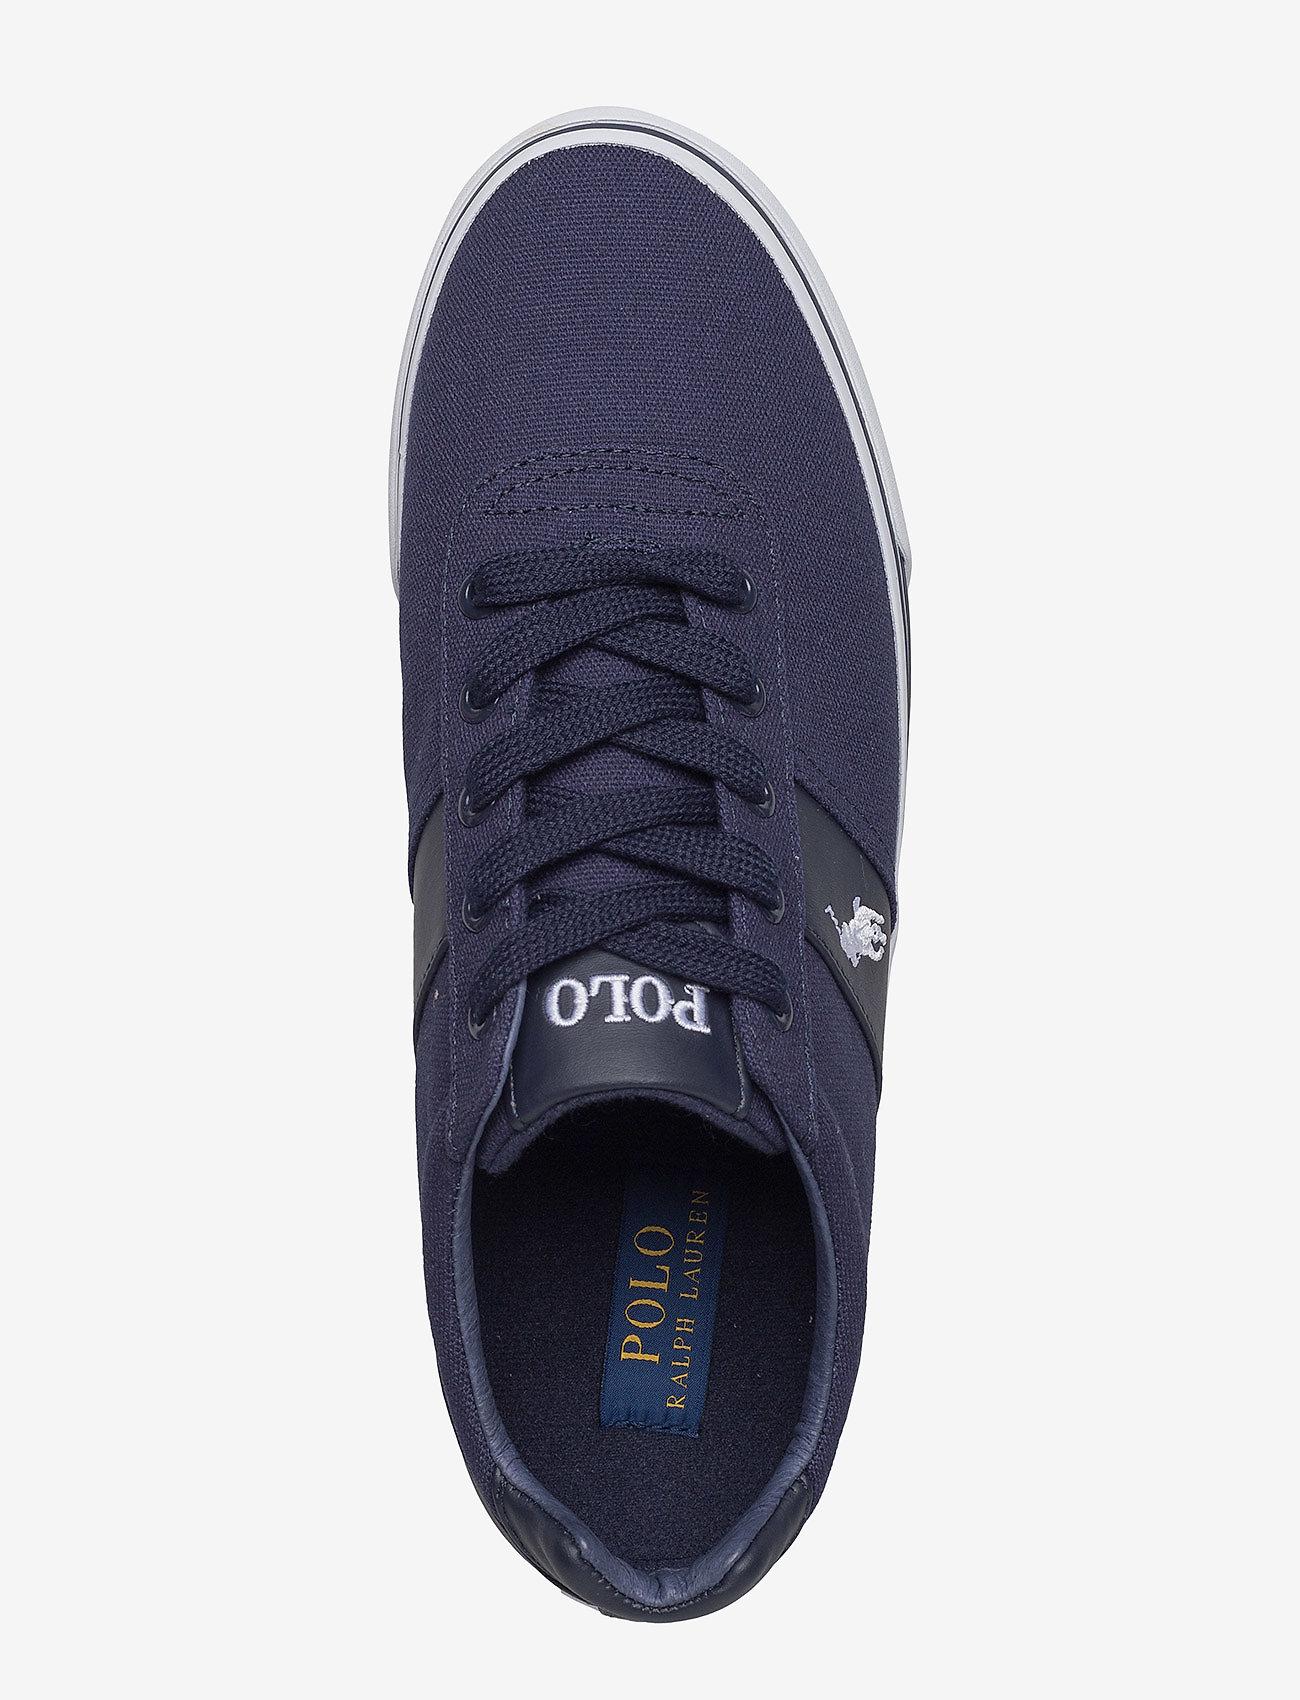 Hanford Canvas Sneaker (Newport Navy) - Polo Ralph Lauren